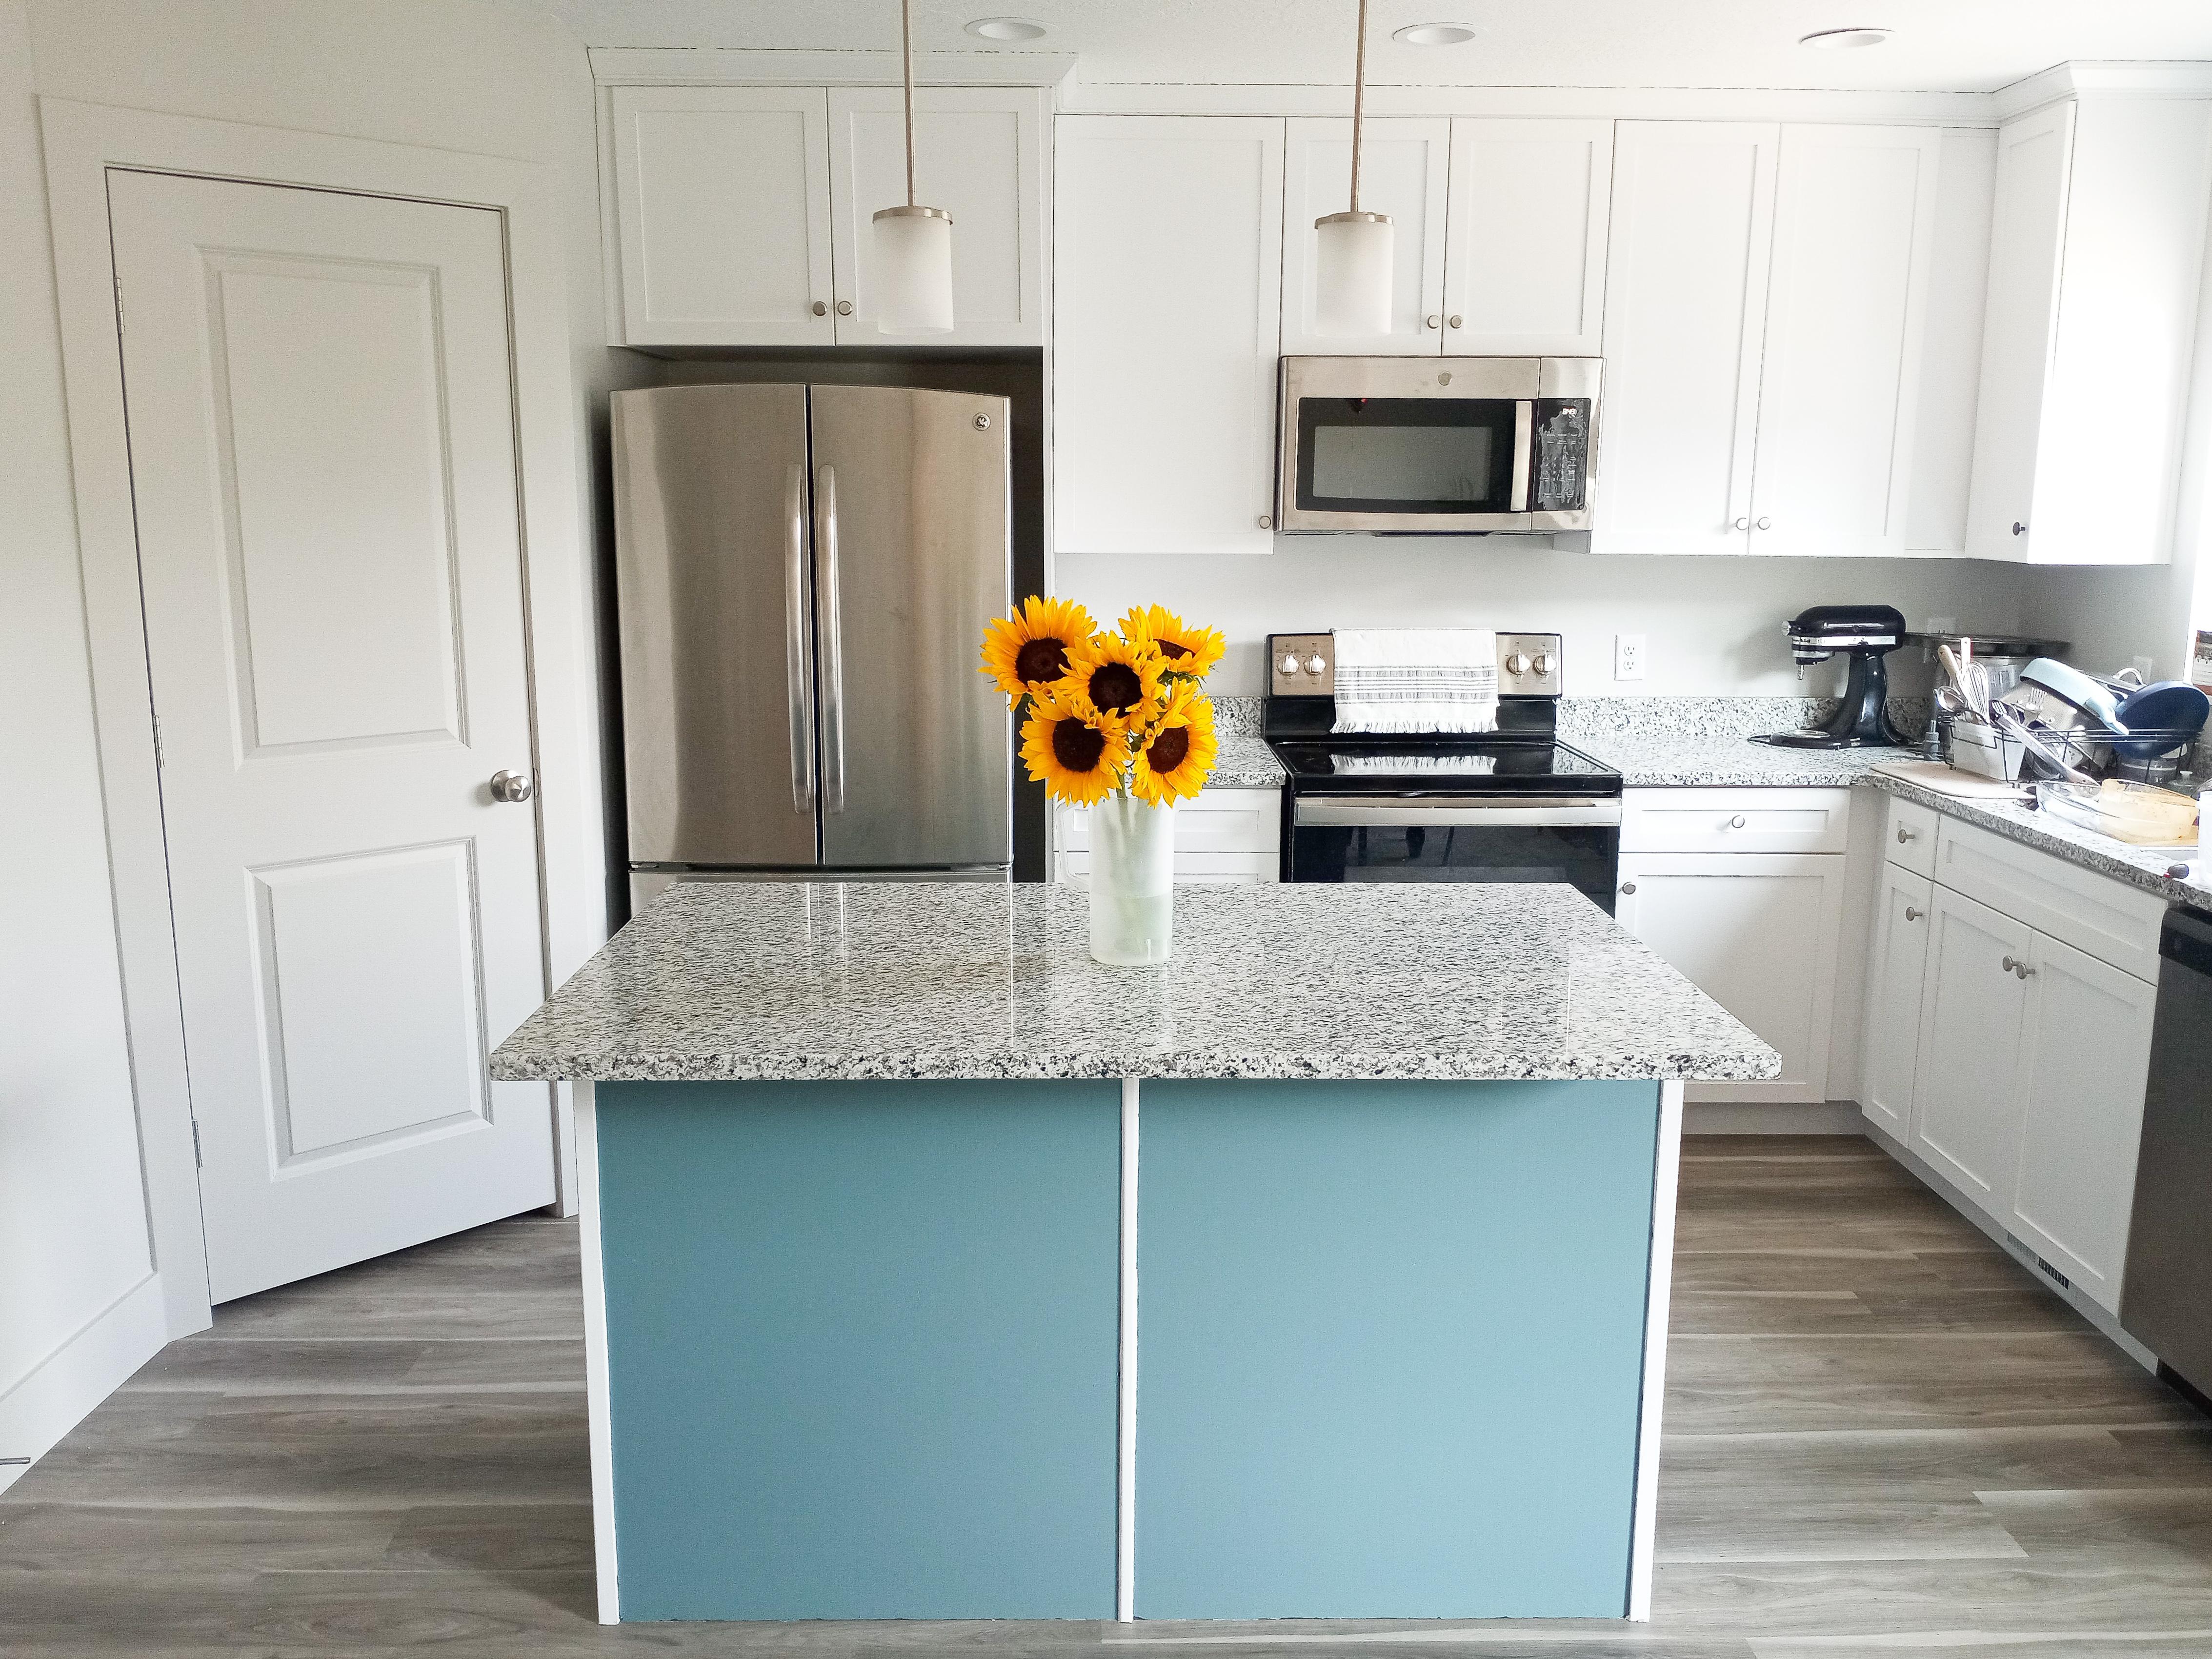 Painting a kitchen island farmhouse blue sunflowers